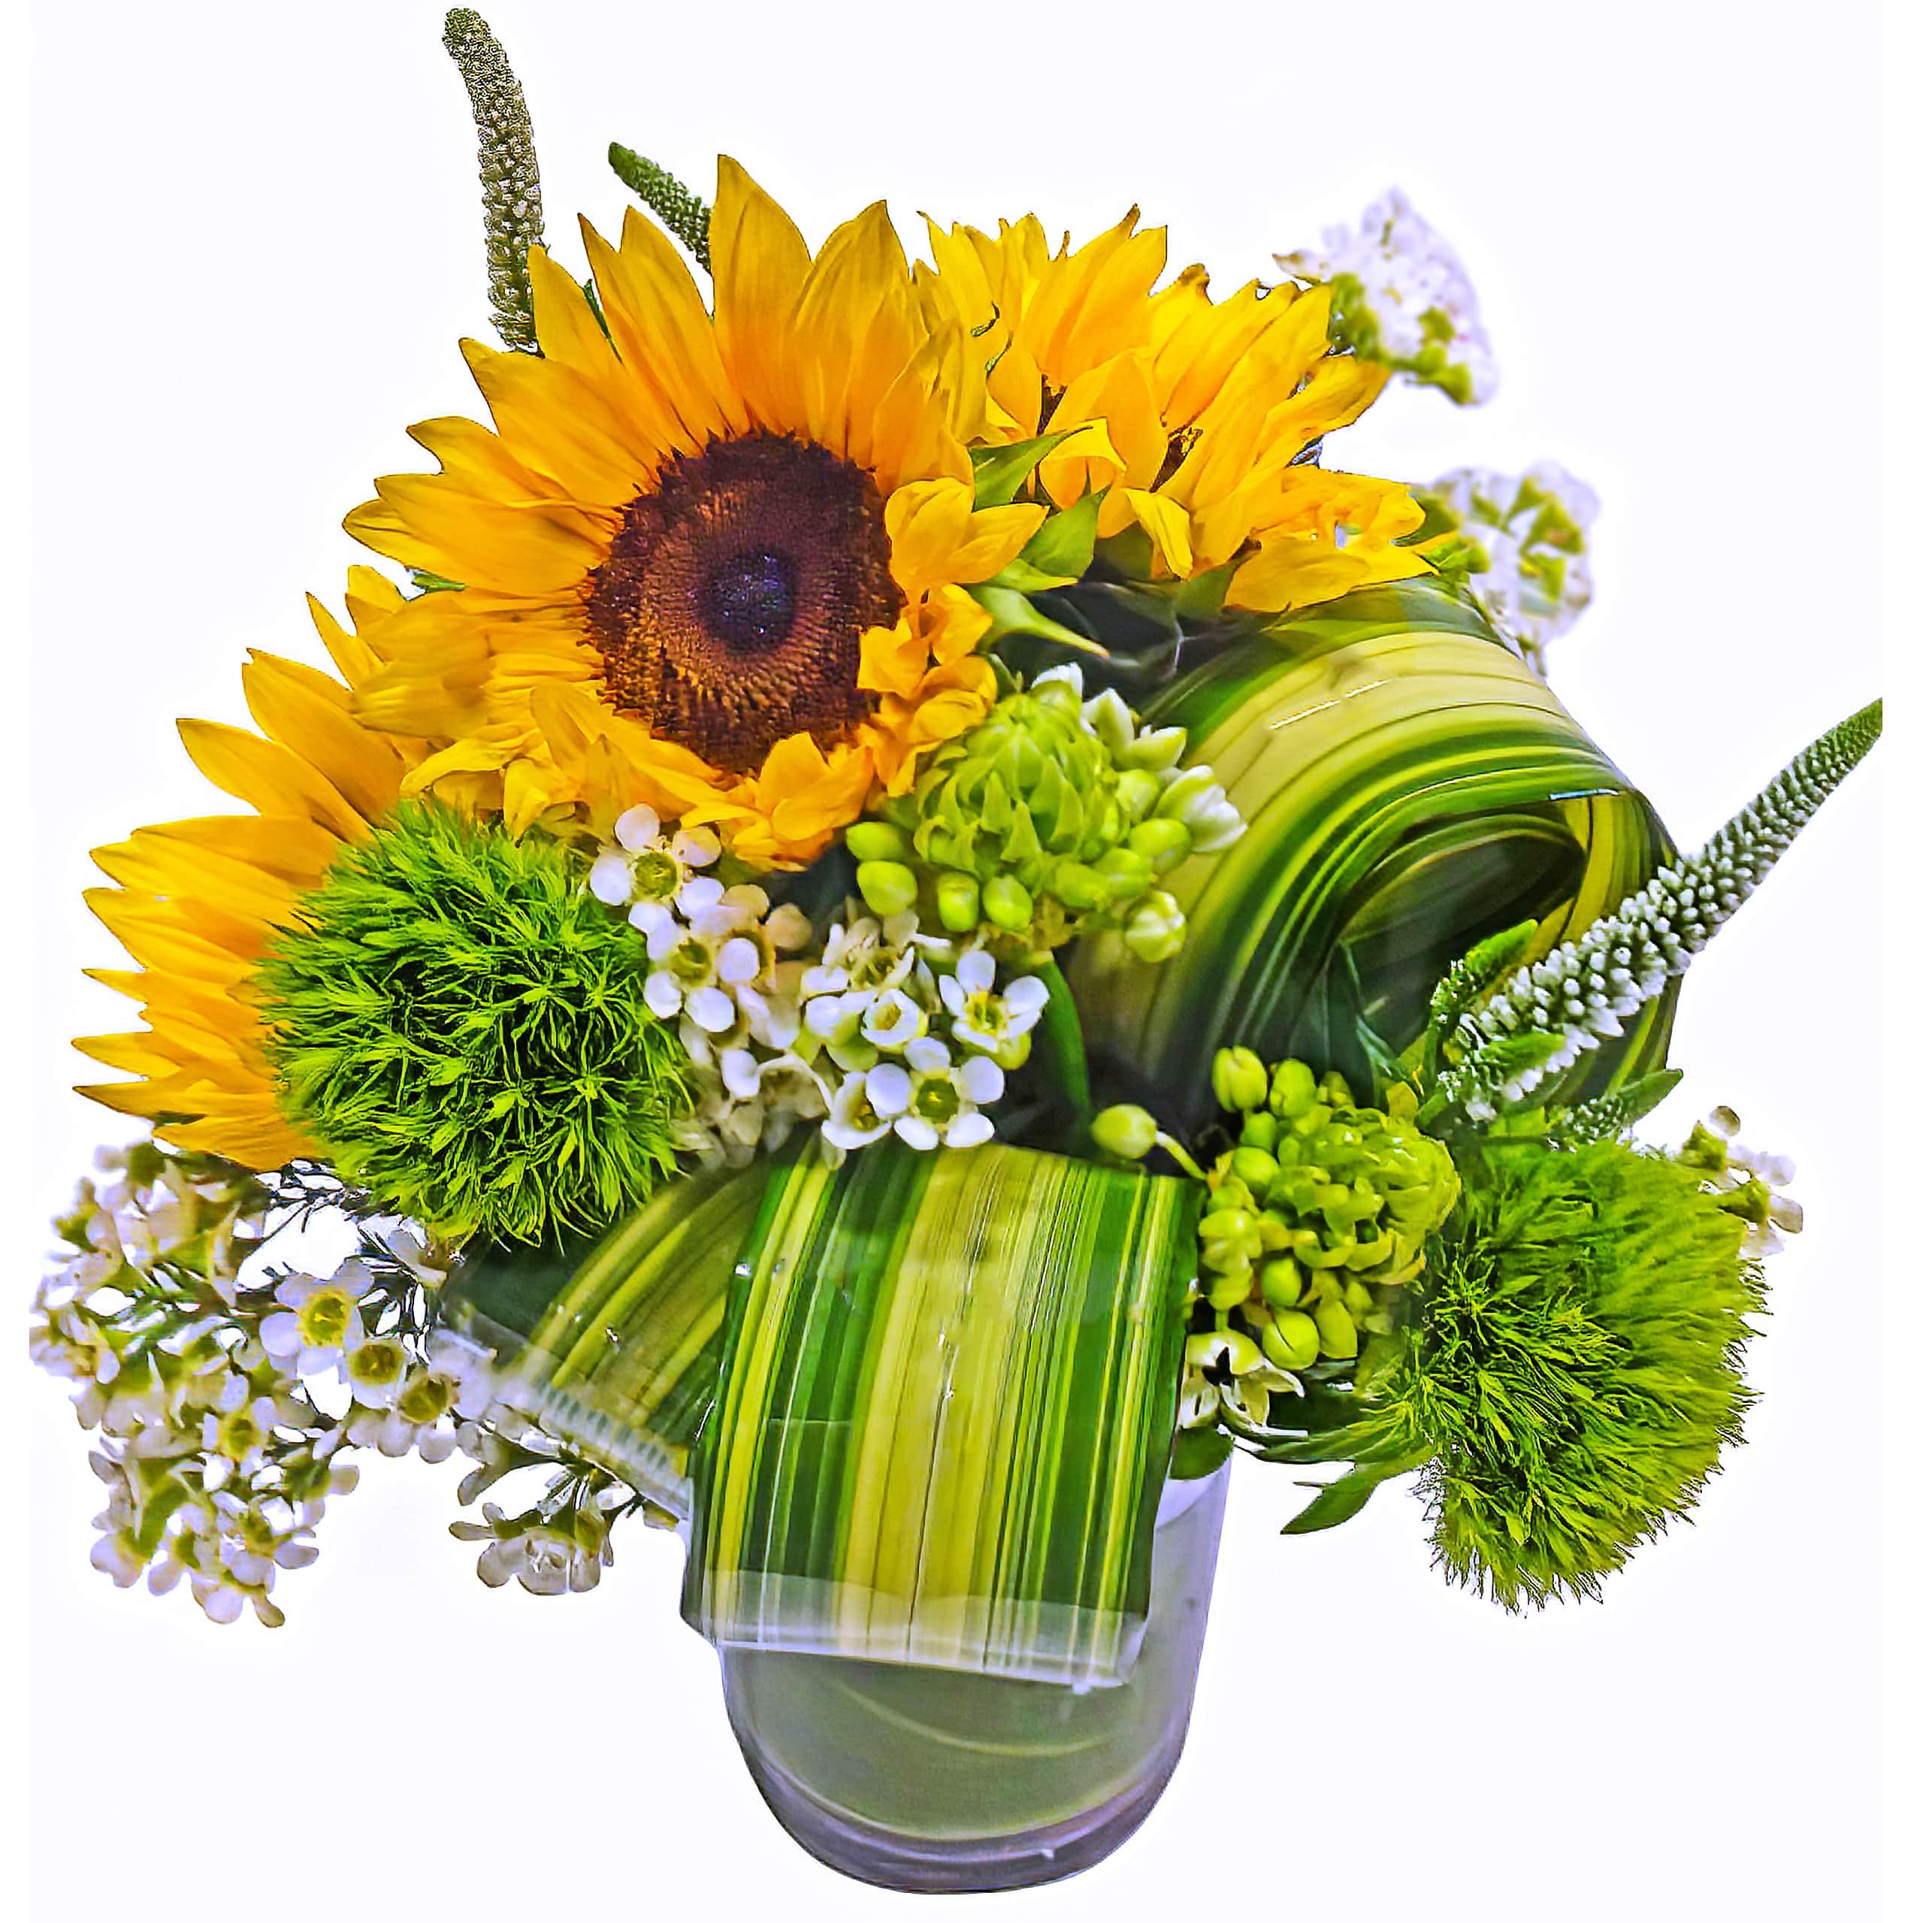 Striped Sunflowers Floral Arrangement